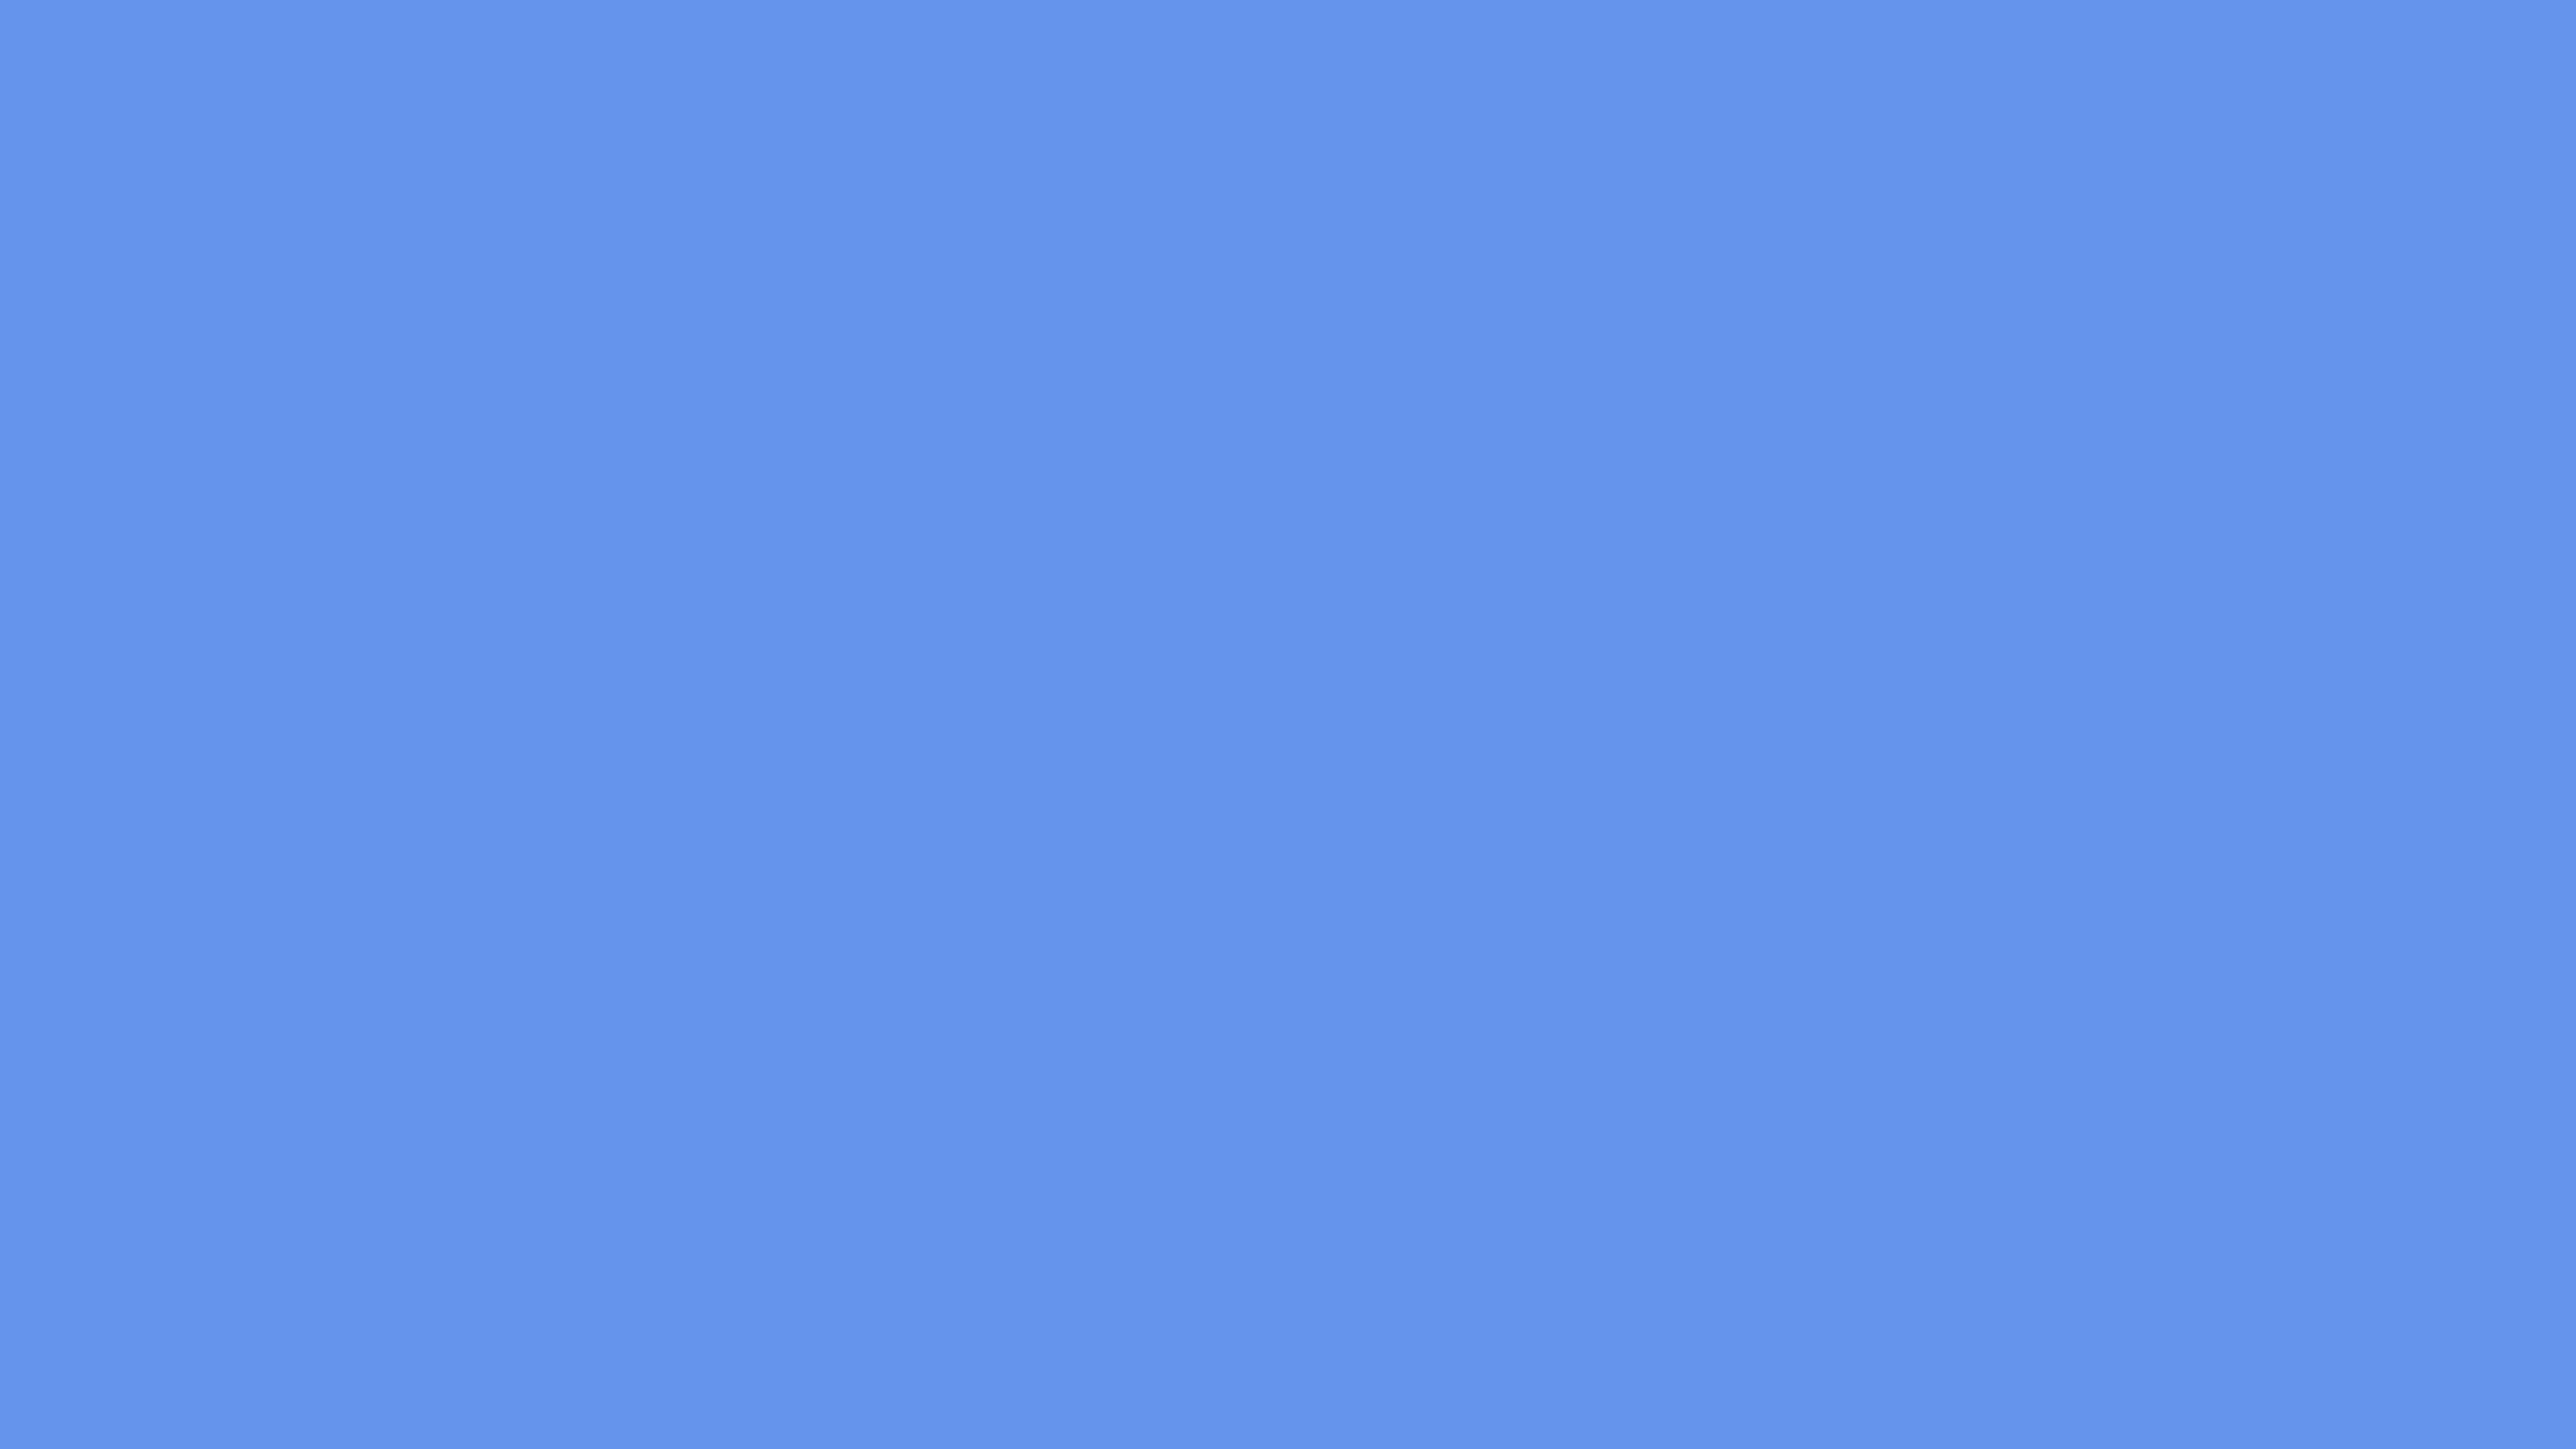 3840x2160 Cornflower Blue Solid Color Background